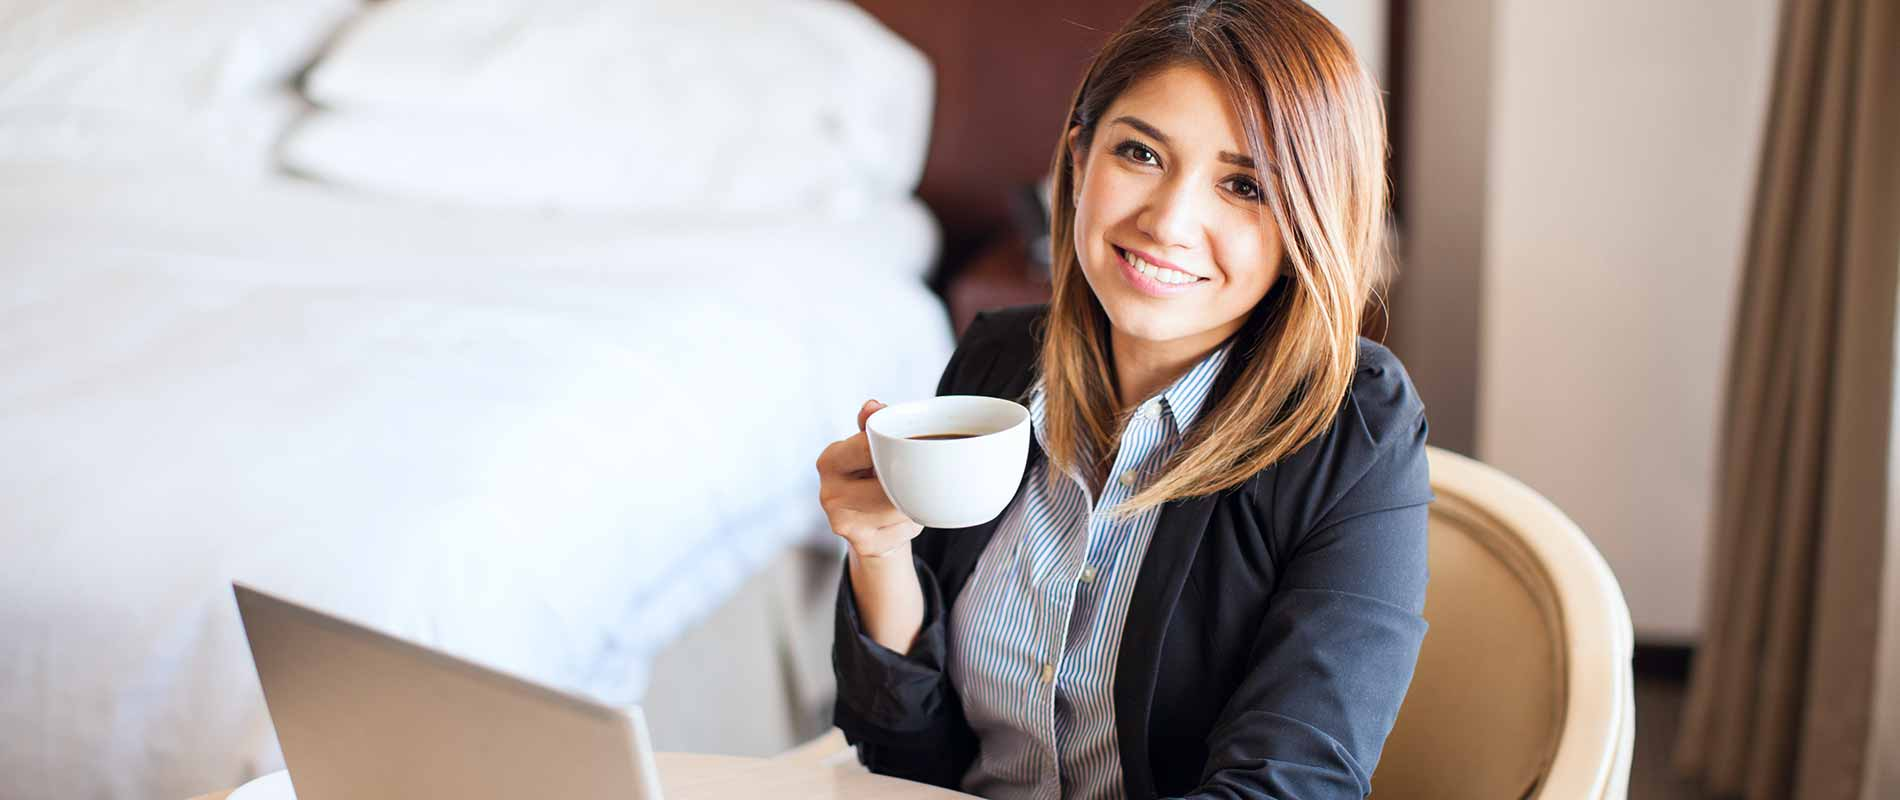 hotel WiFi, guest WiFi, hospitality WiFi, hotel internet services